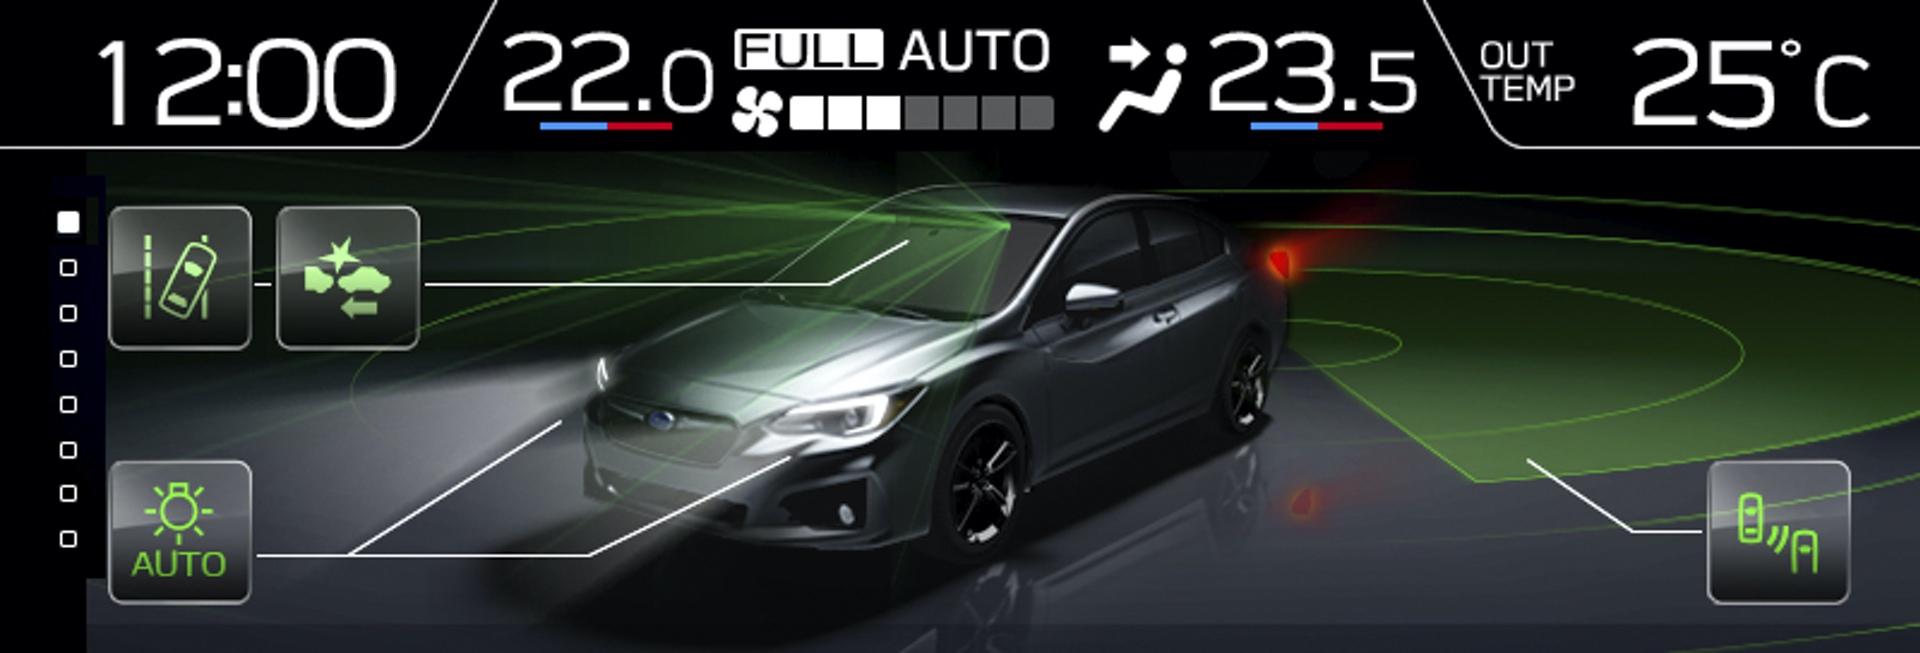 First_Drive_Subaru_Impreza_0020